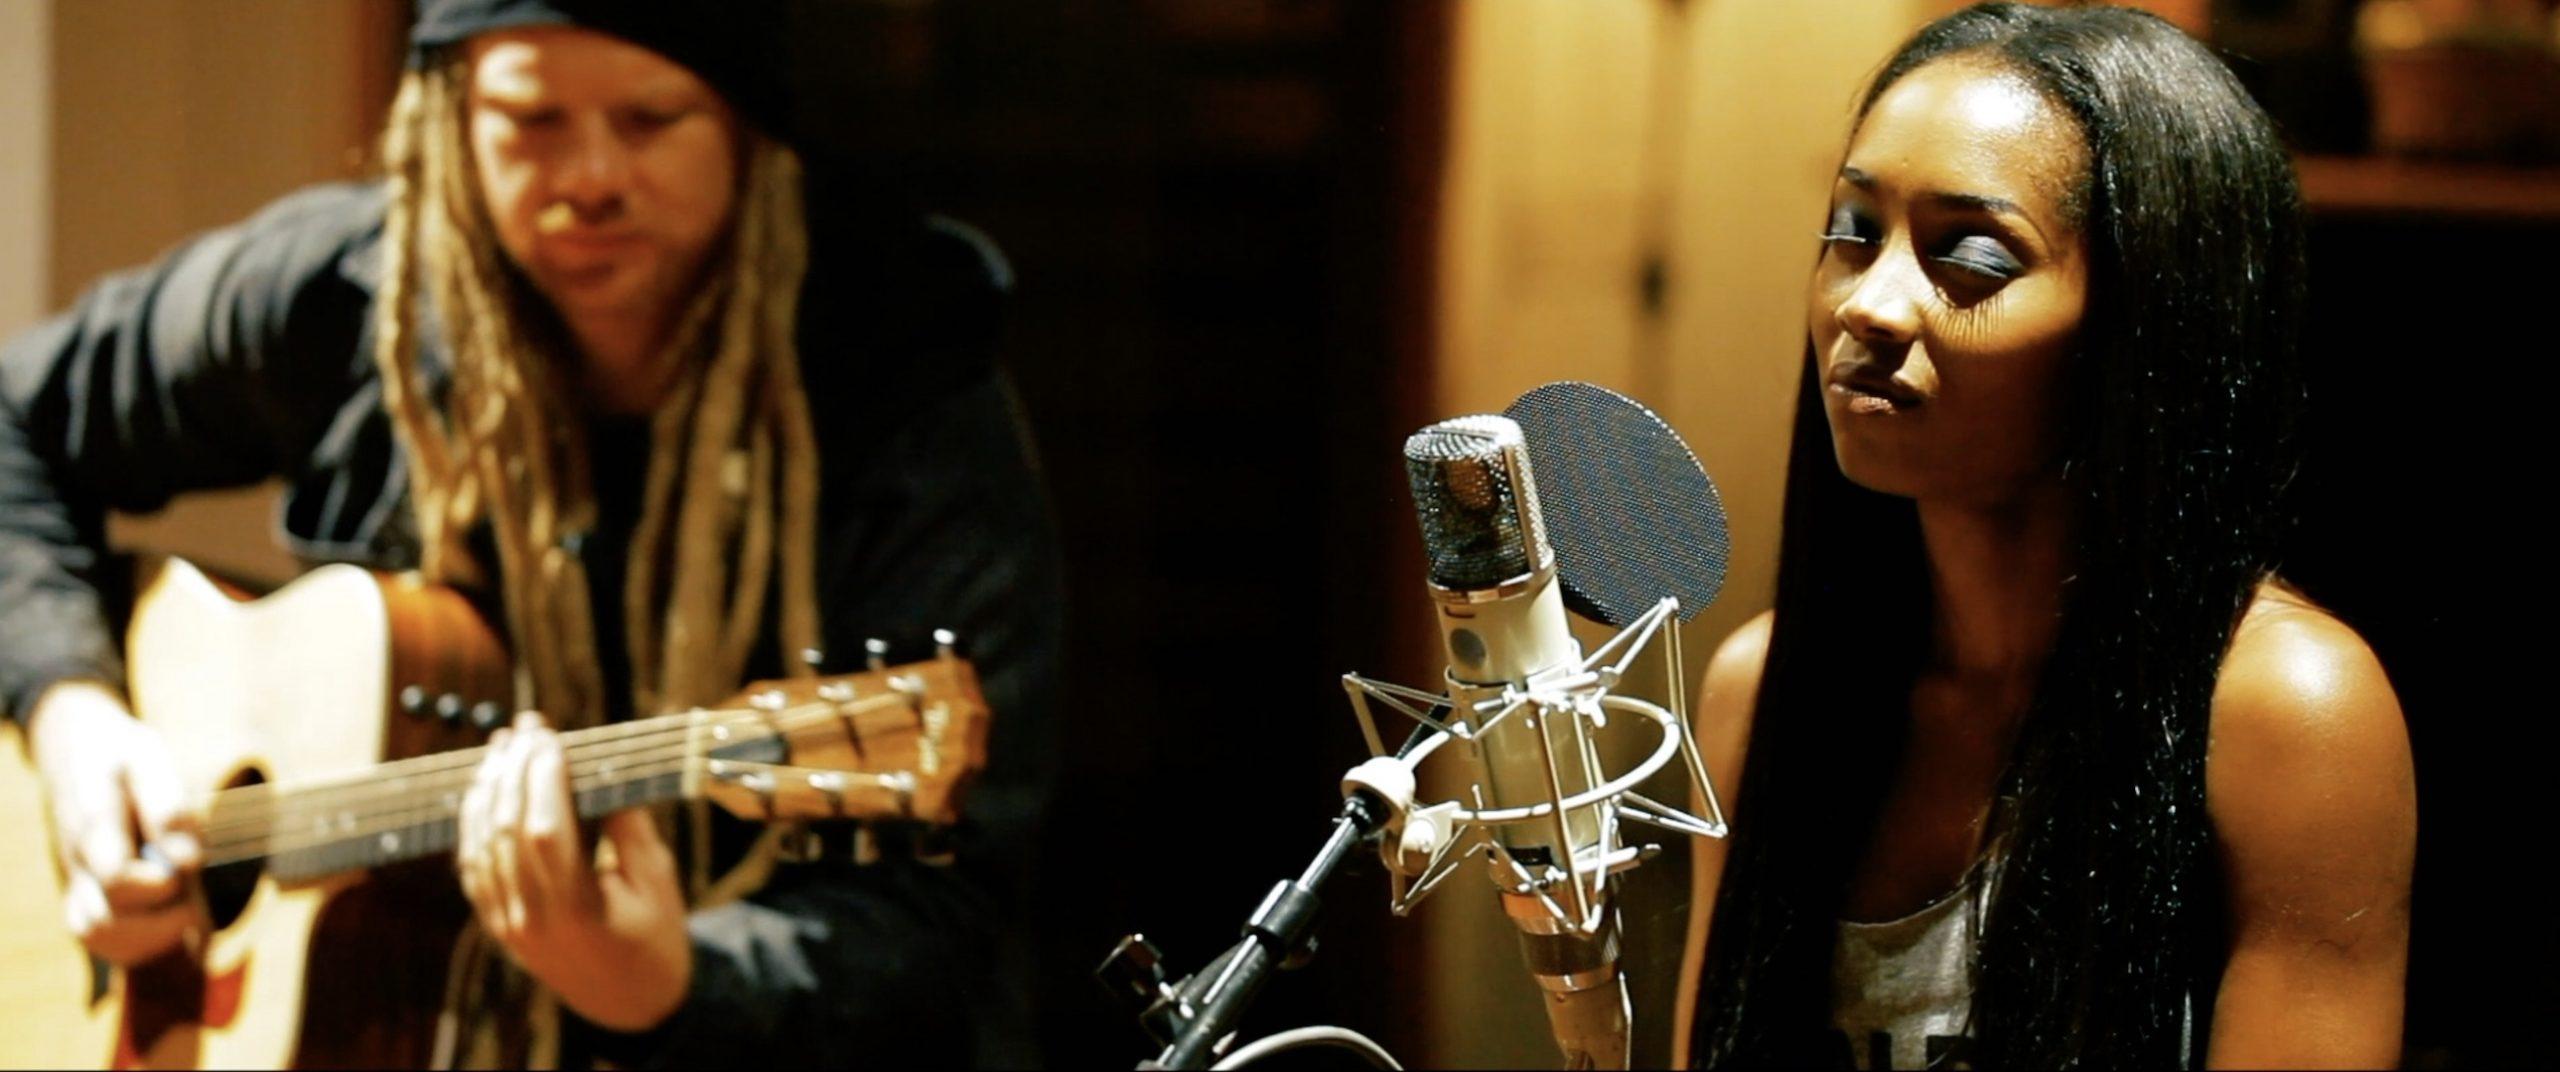 Crystal Tamar singing Serenade, accompanied on guitar by Ben Misterka